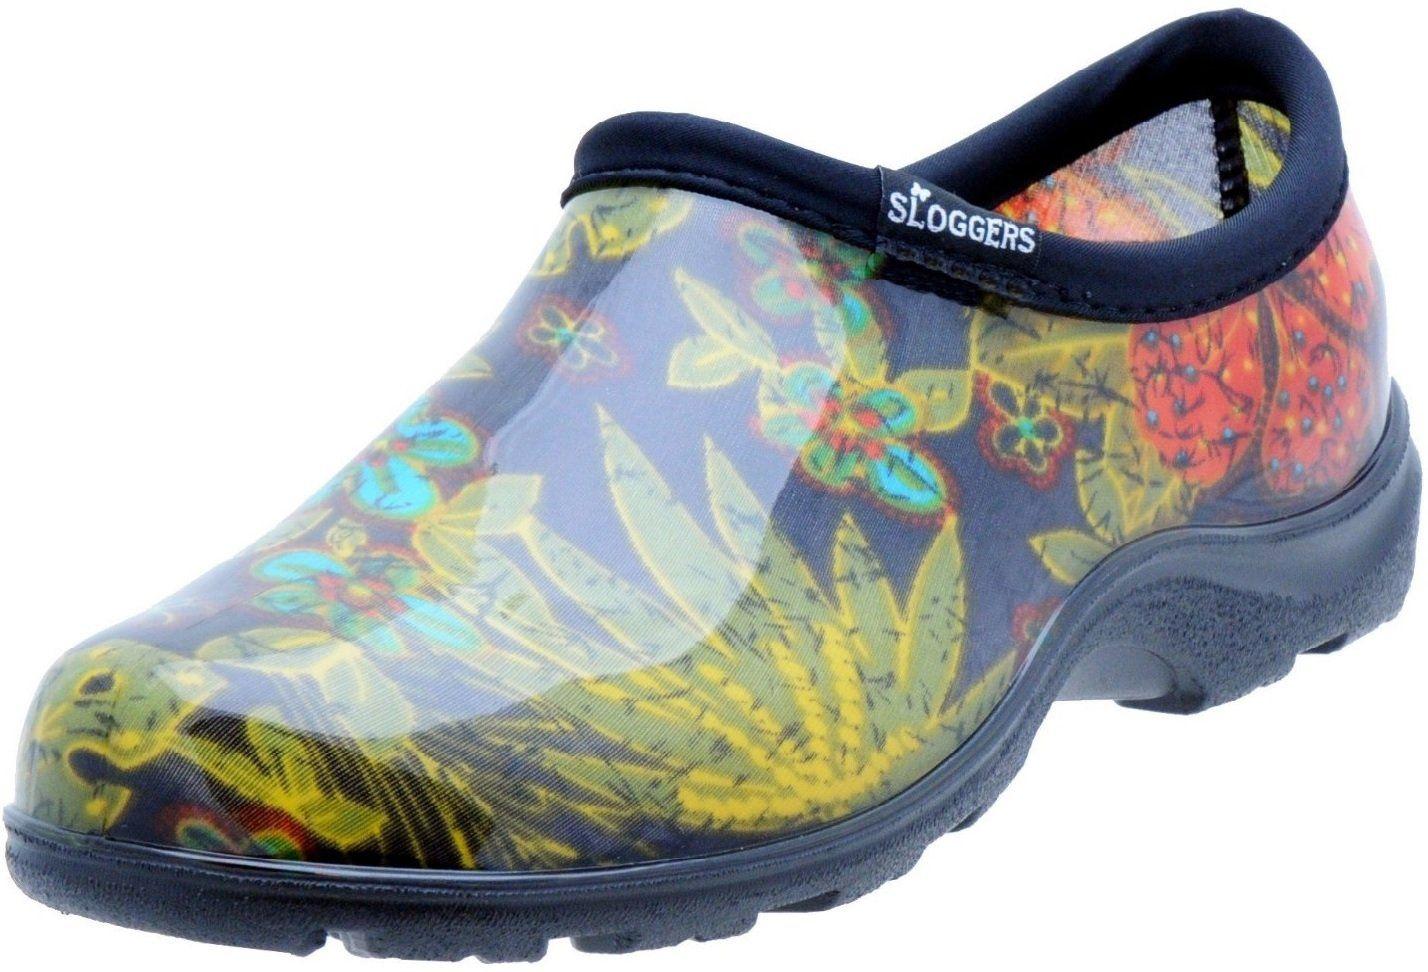 Sloggers 5102bk10 Women S Garden Shoes Midsummer Black Size 10